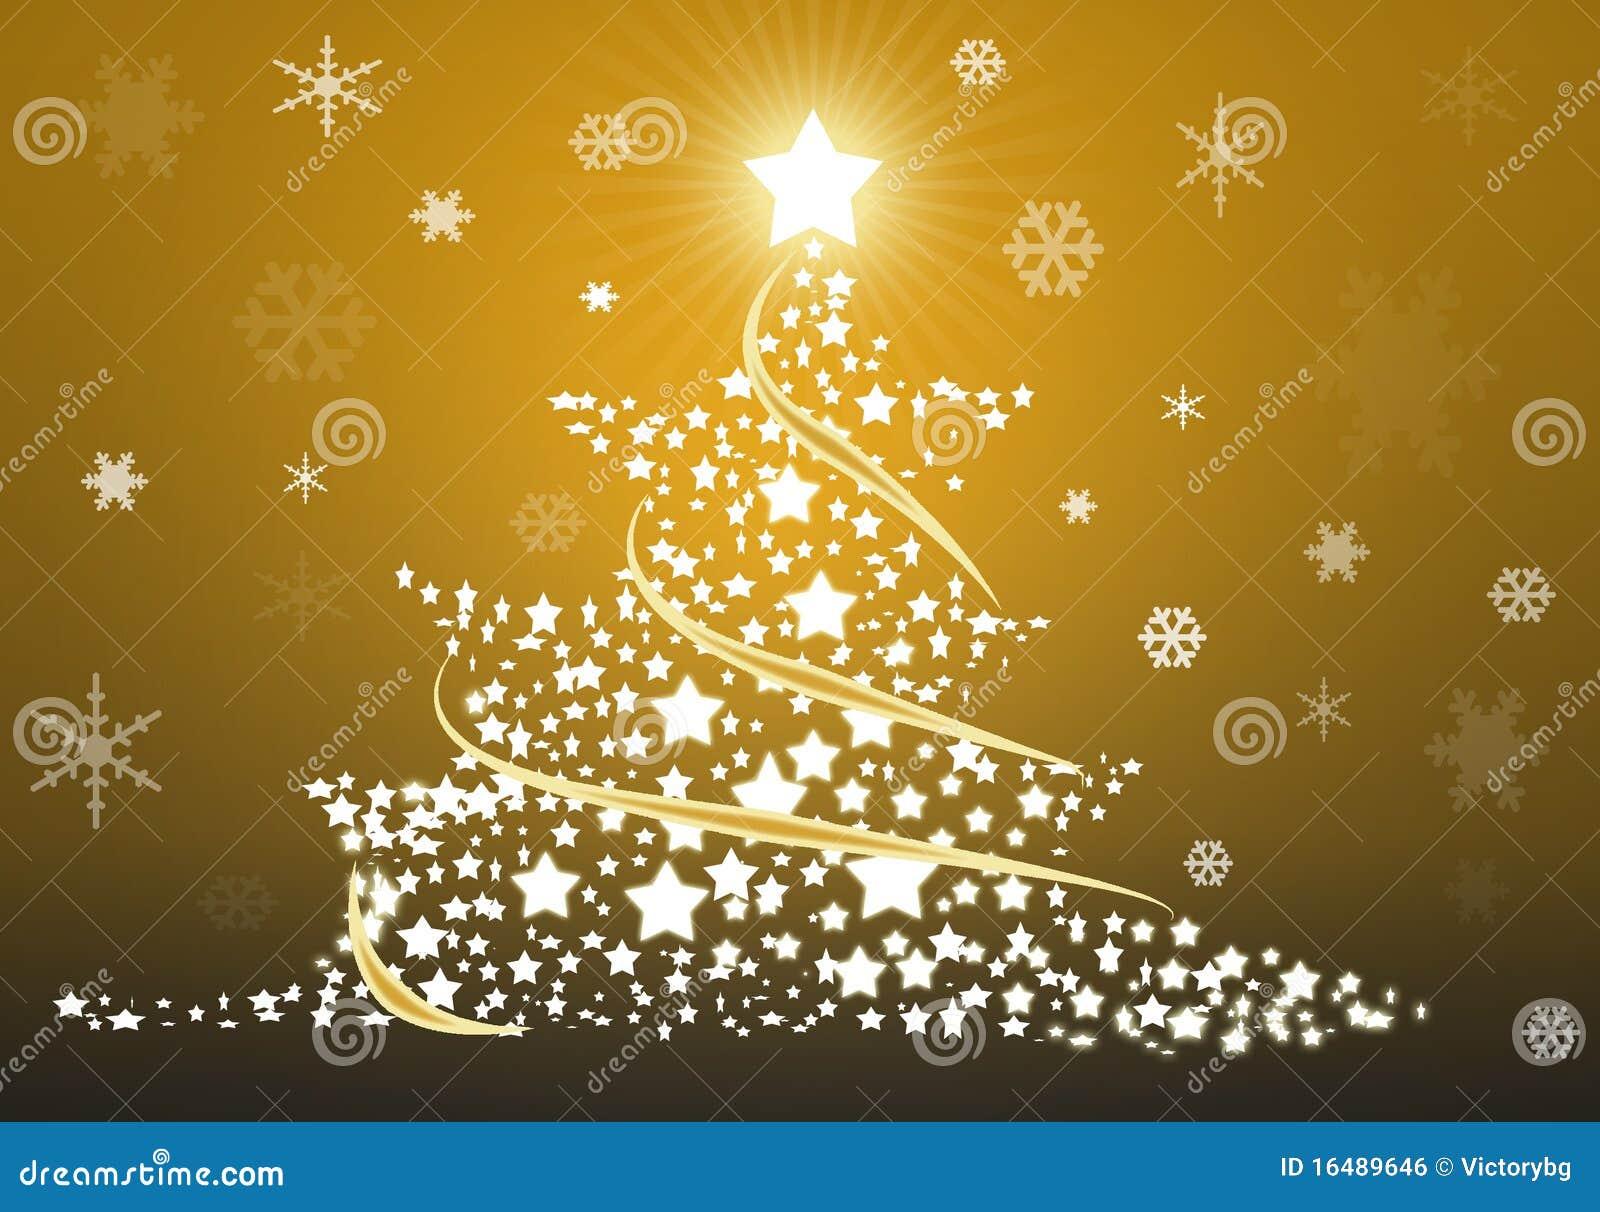 Gold Christmas Tree Background Stock Illustration Illustration Of